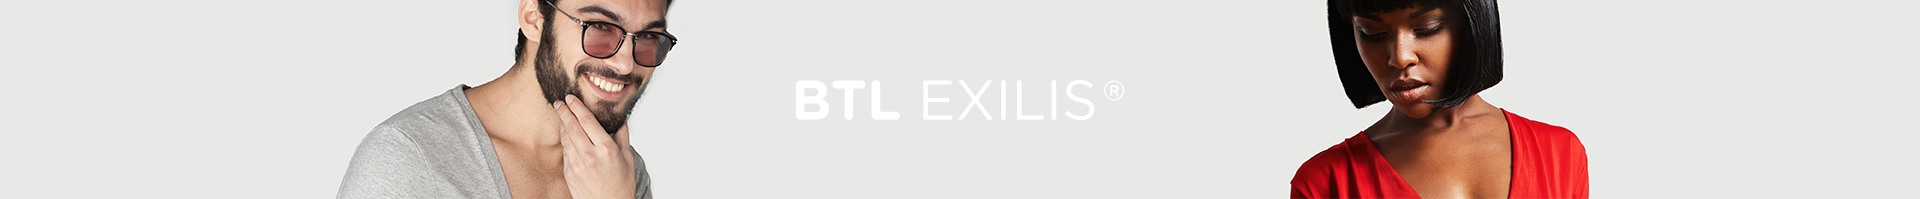 header-exilis